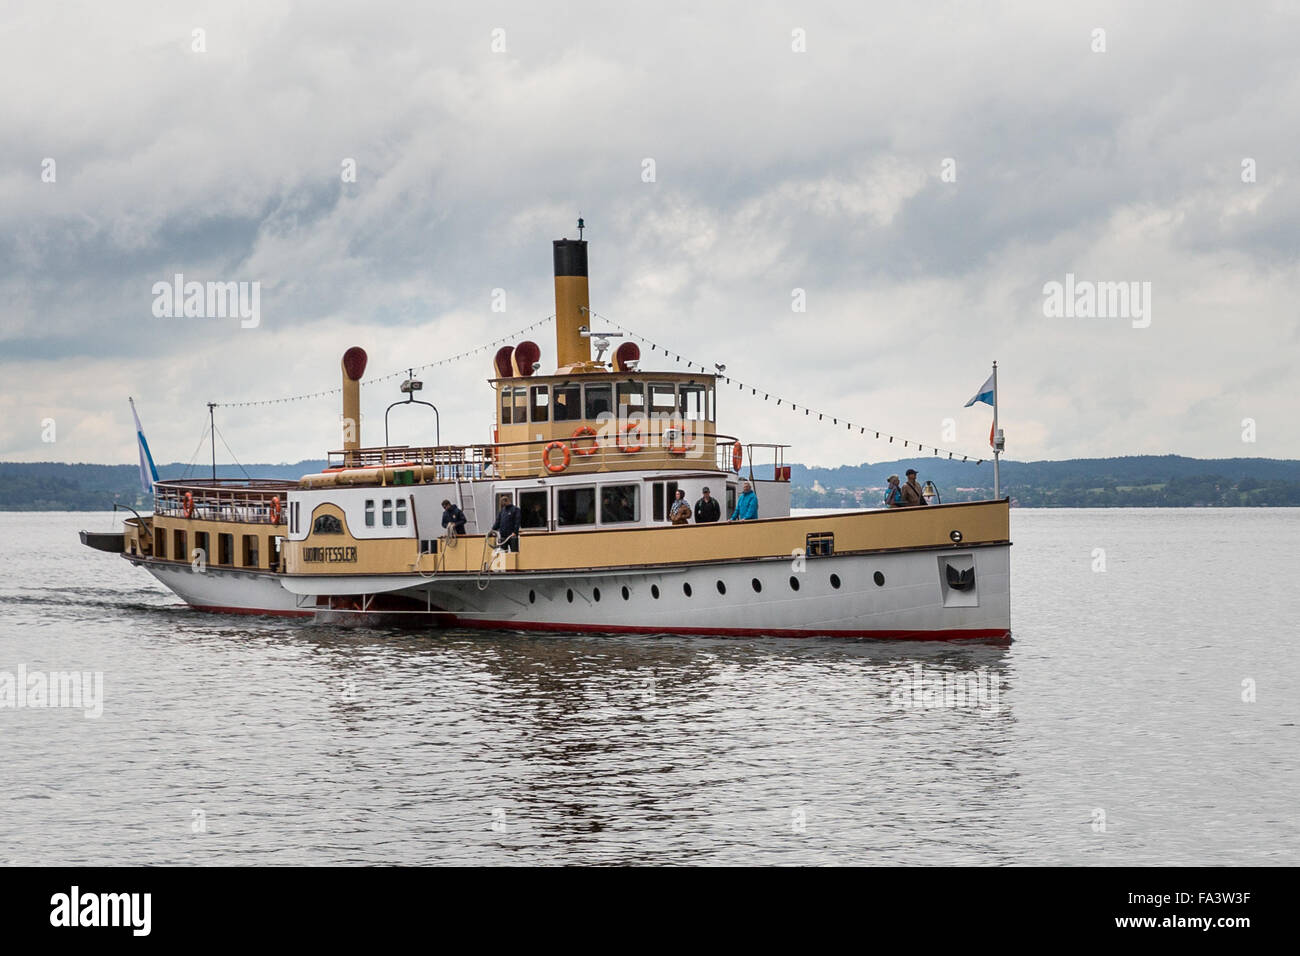 Herreninsel, Chiemsee, Germany, lake, water, boat trip, tourism, travel, island, - Stock Image